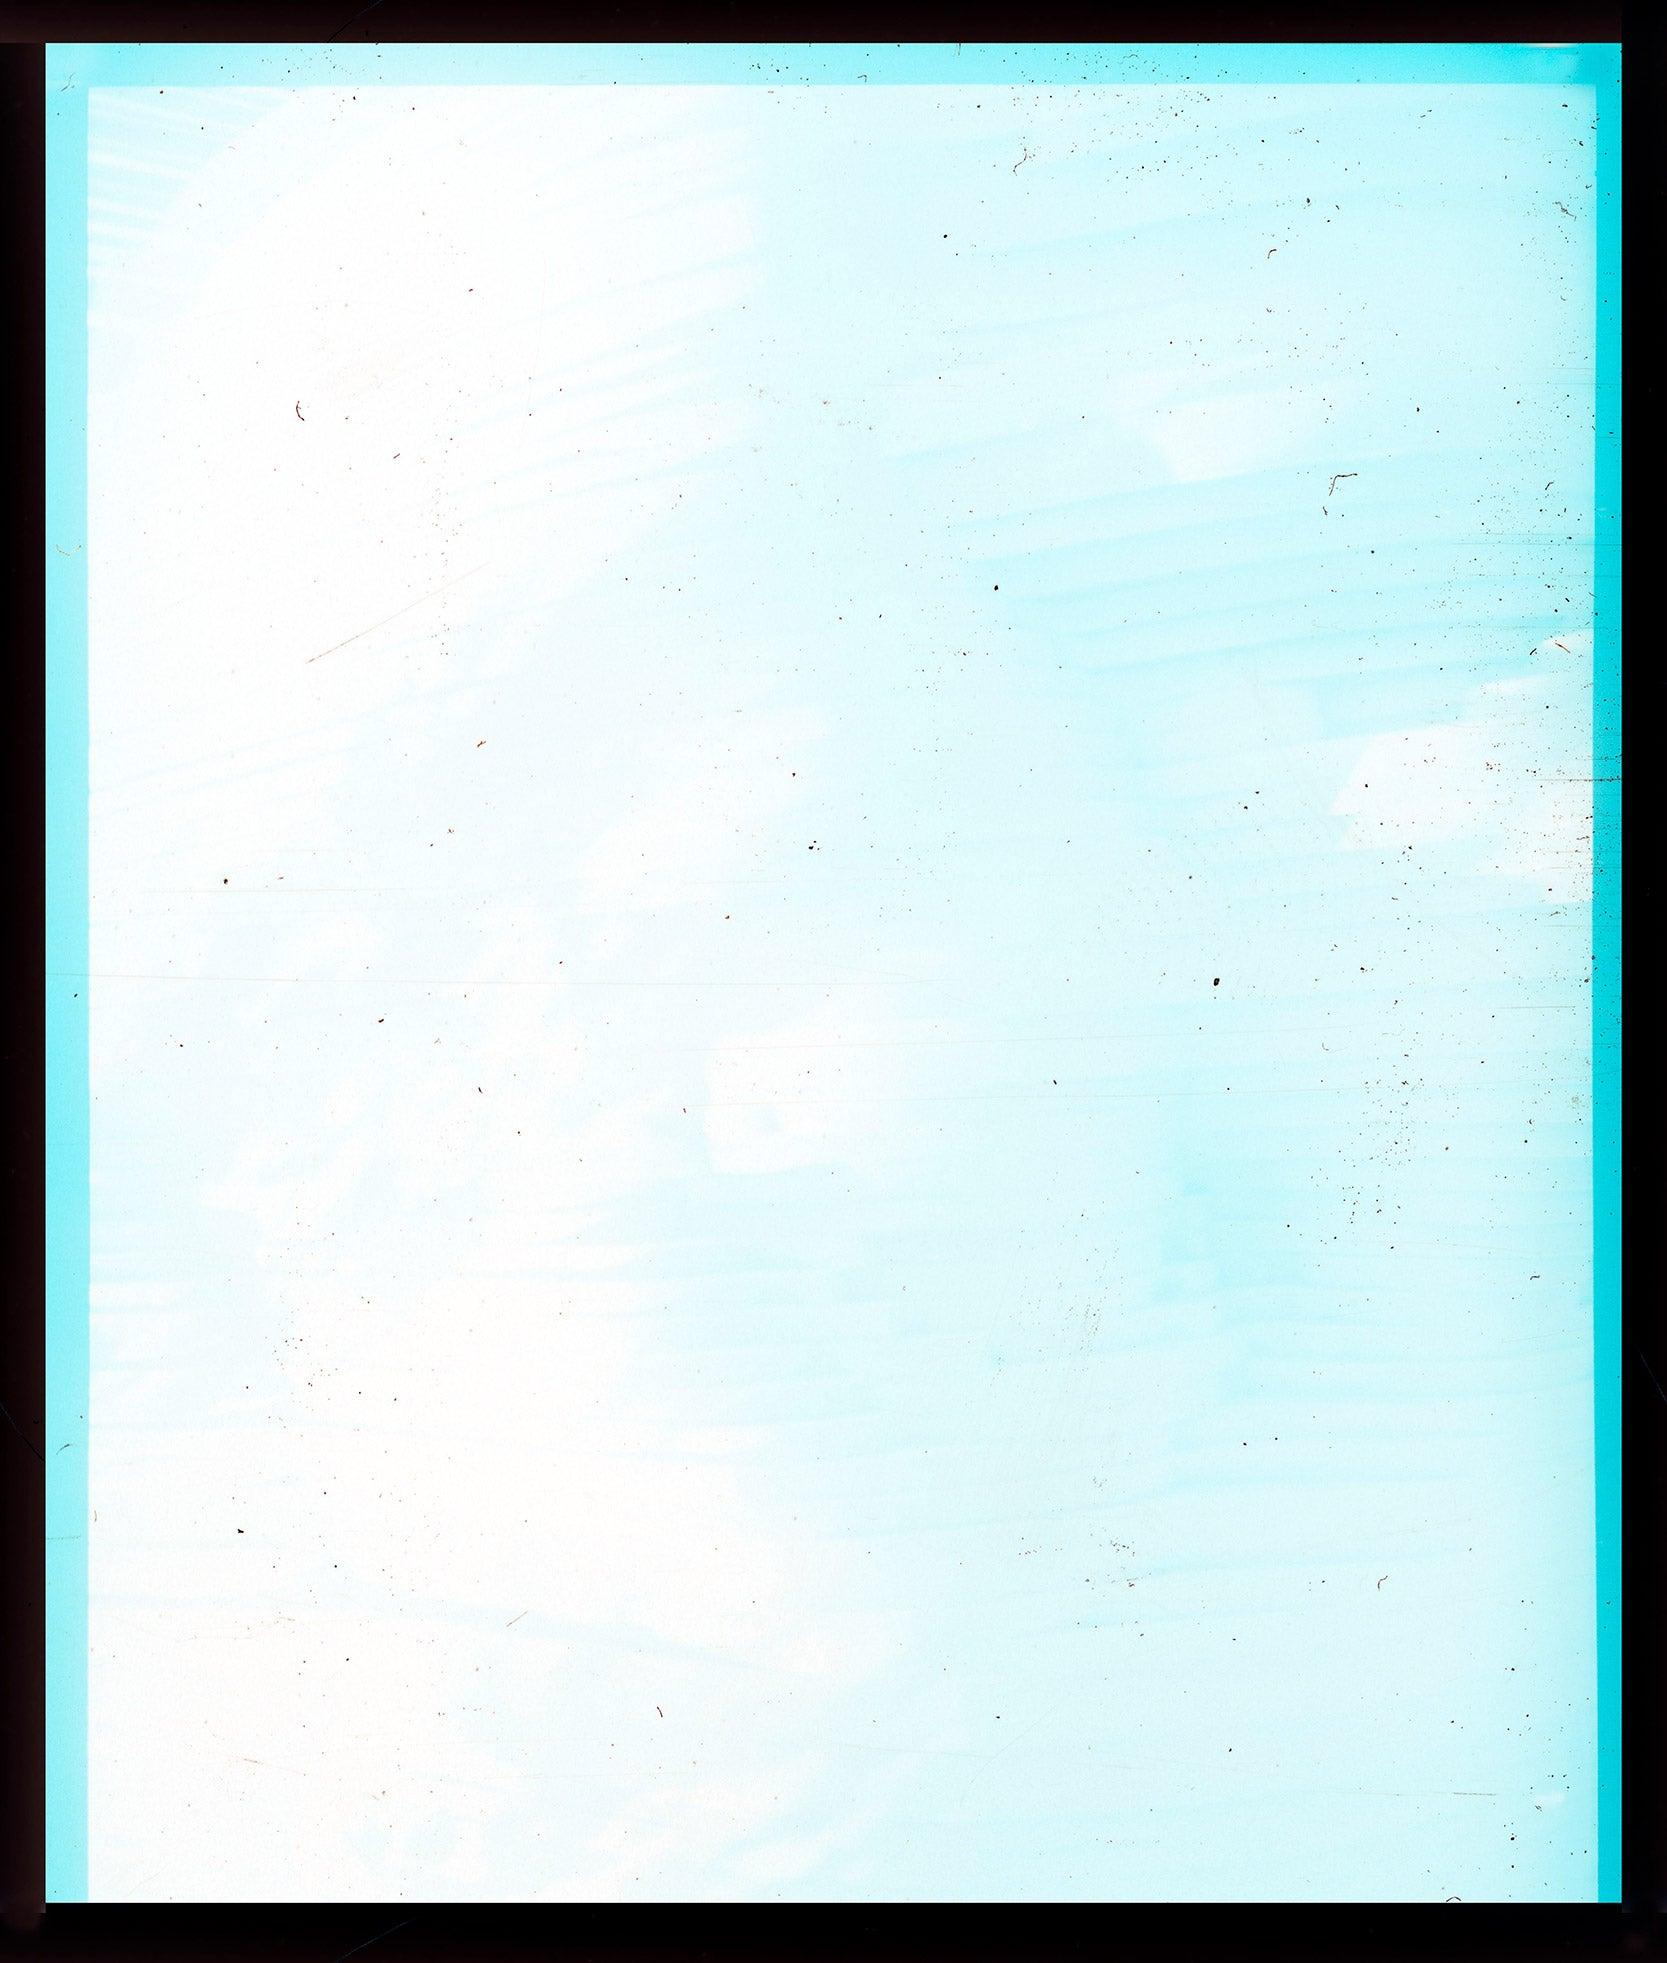 Emulsions-in-Departure-#13